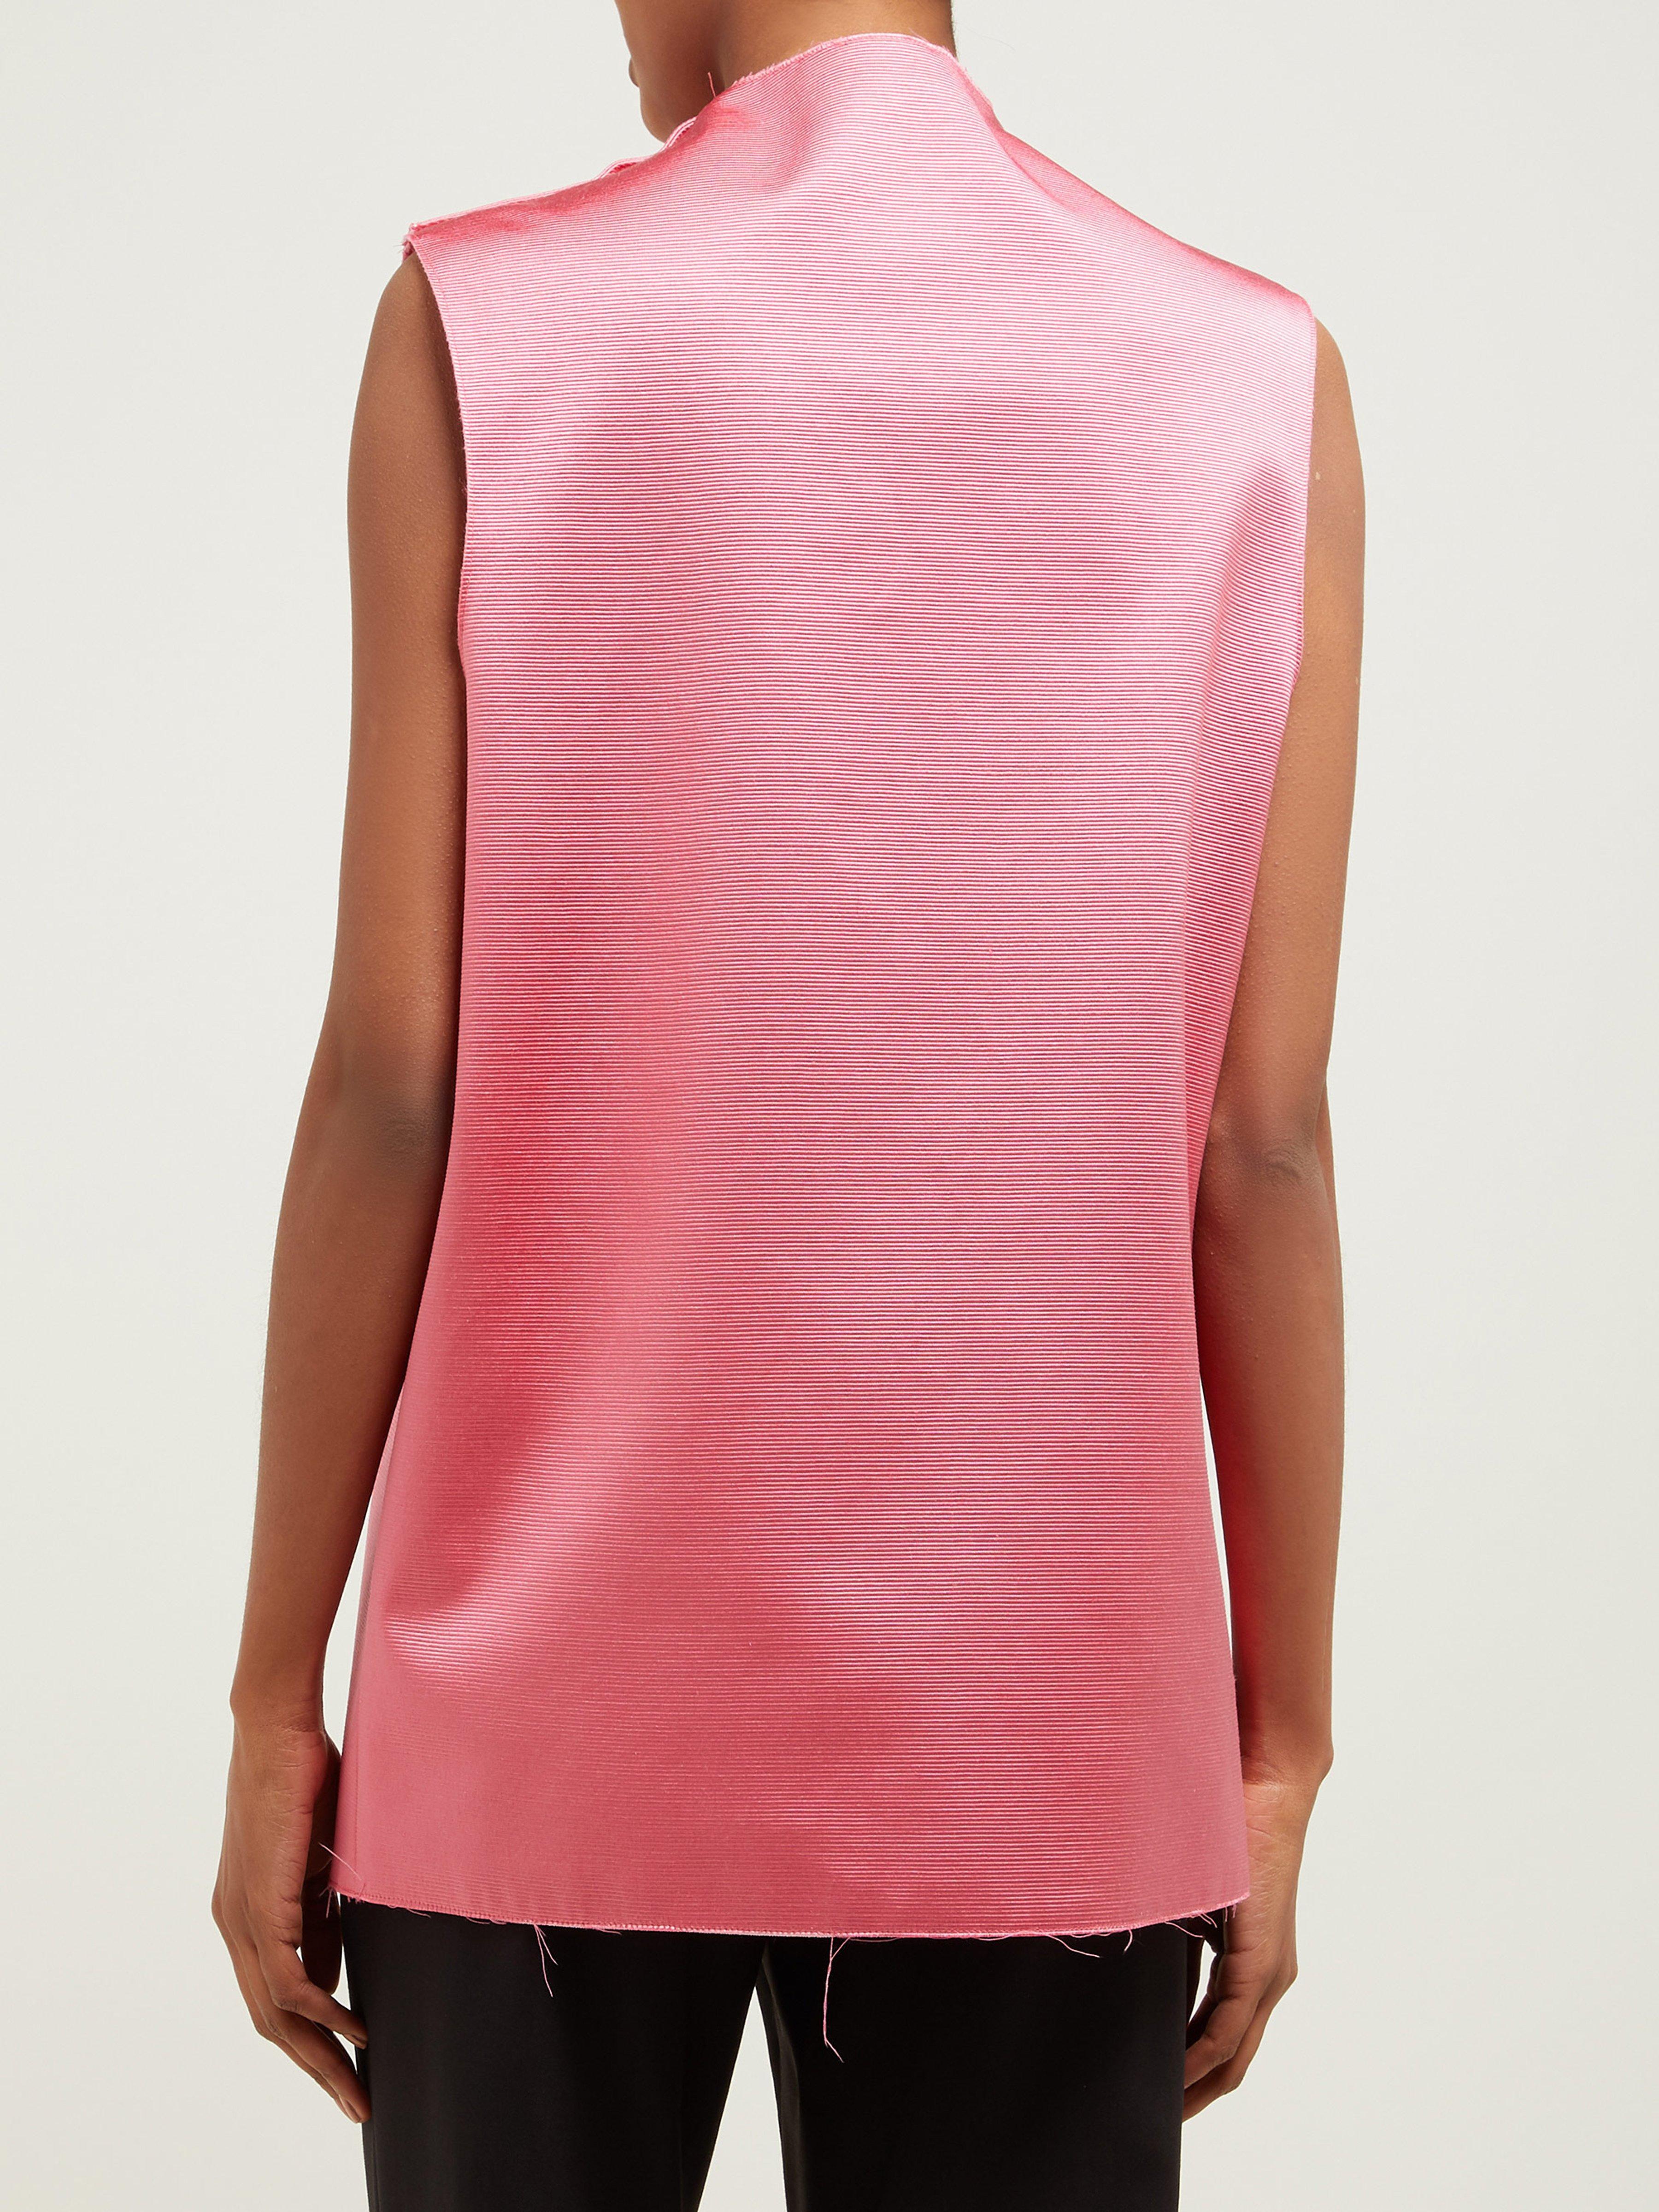 0fe16ba0c15b9e Raf Simons - Pink Photographic Print Sleeveless Silk Blend Top - Lyst. View  fullscreen